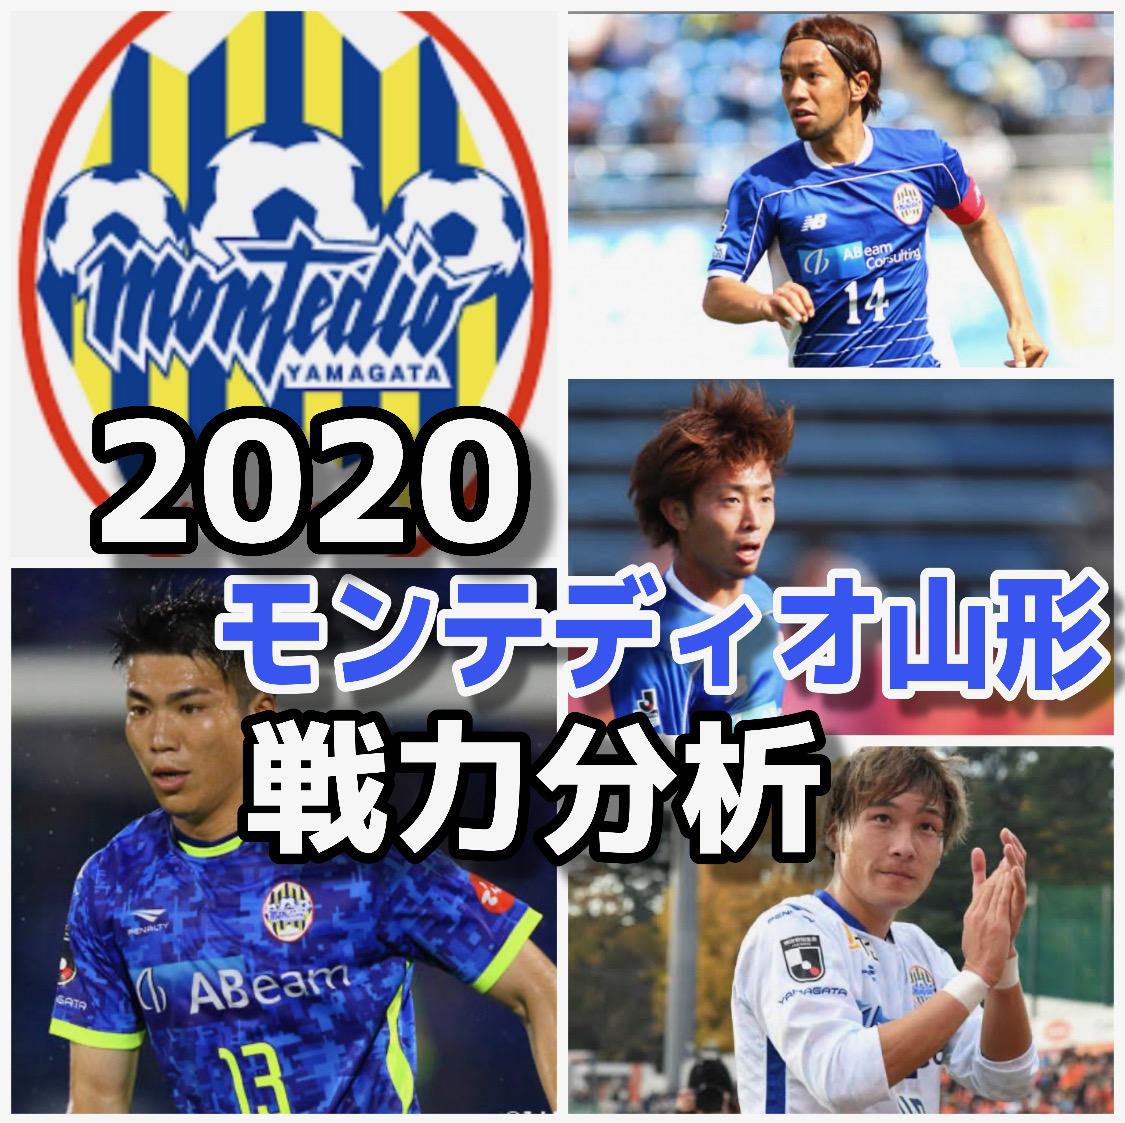 f:id:yamadaman0618:20200302230619j:plain